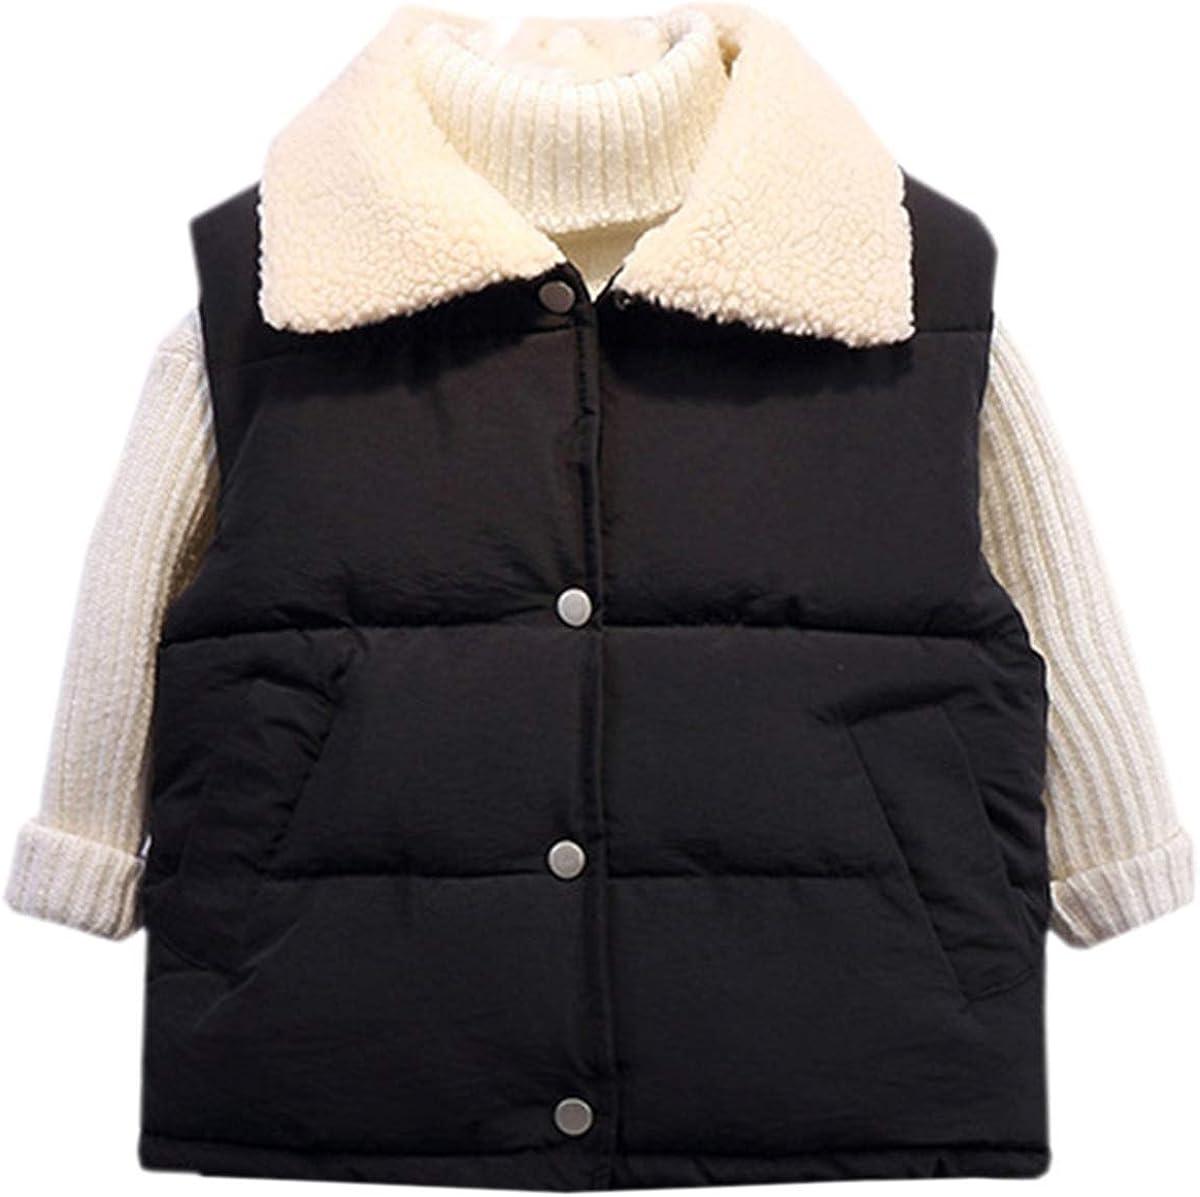 Betusline Boys's Lapel Sherpa Lined Warm Down Vest Sleeveless Jacket, 2-10 Years